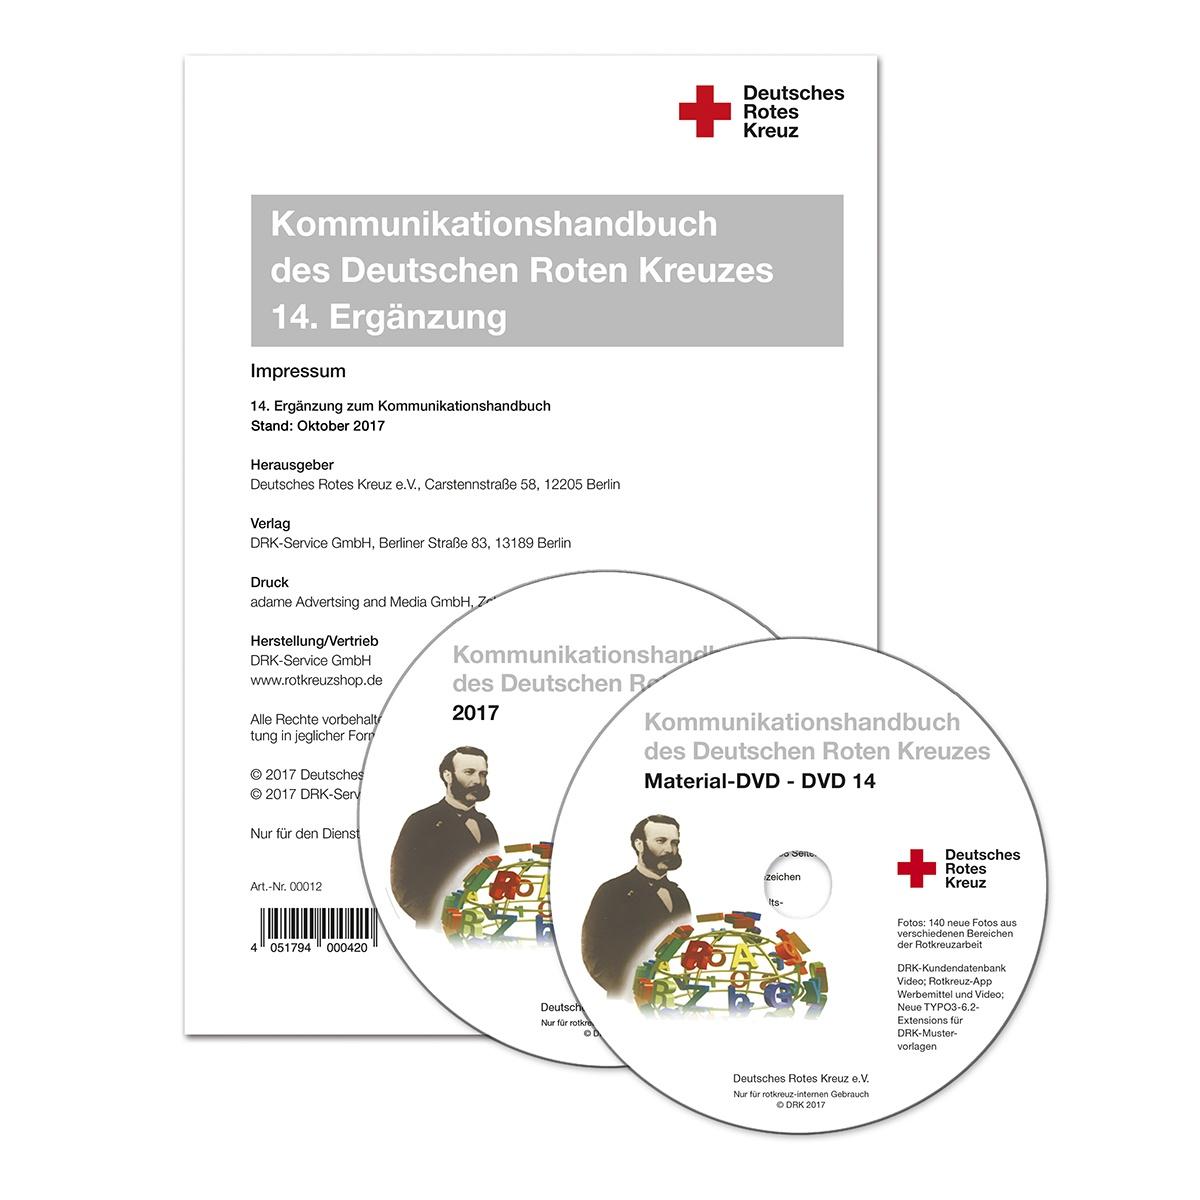 Kommunikationshandbuch, 14. Ergänzung (Abo) - rotkreuzshop.de